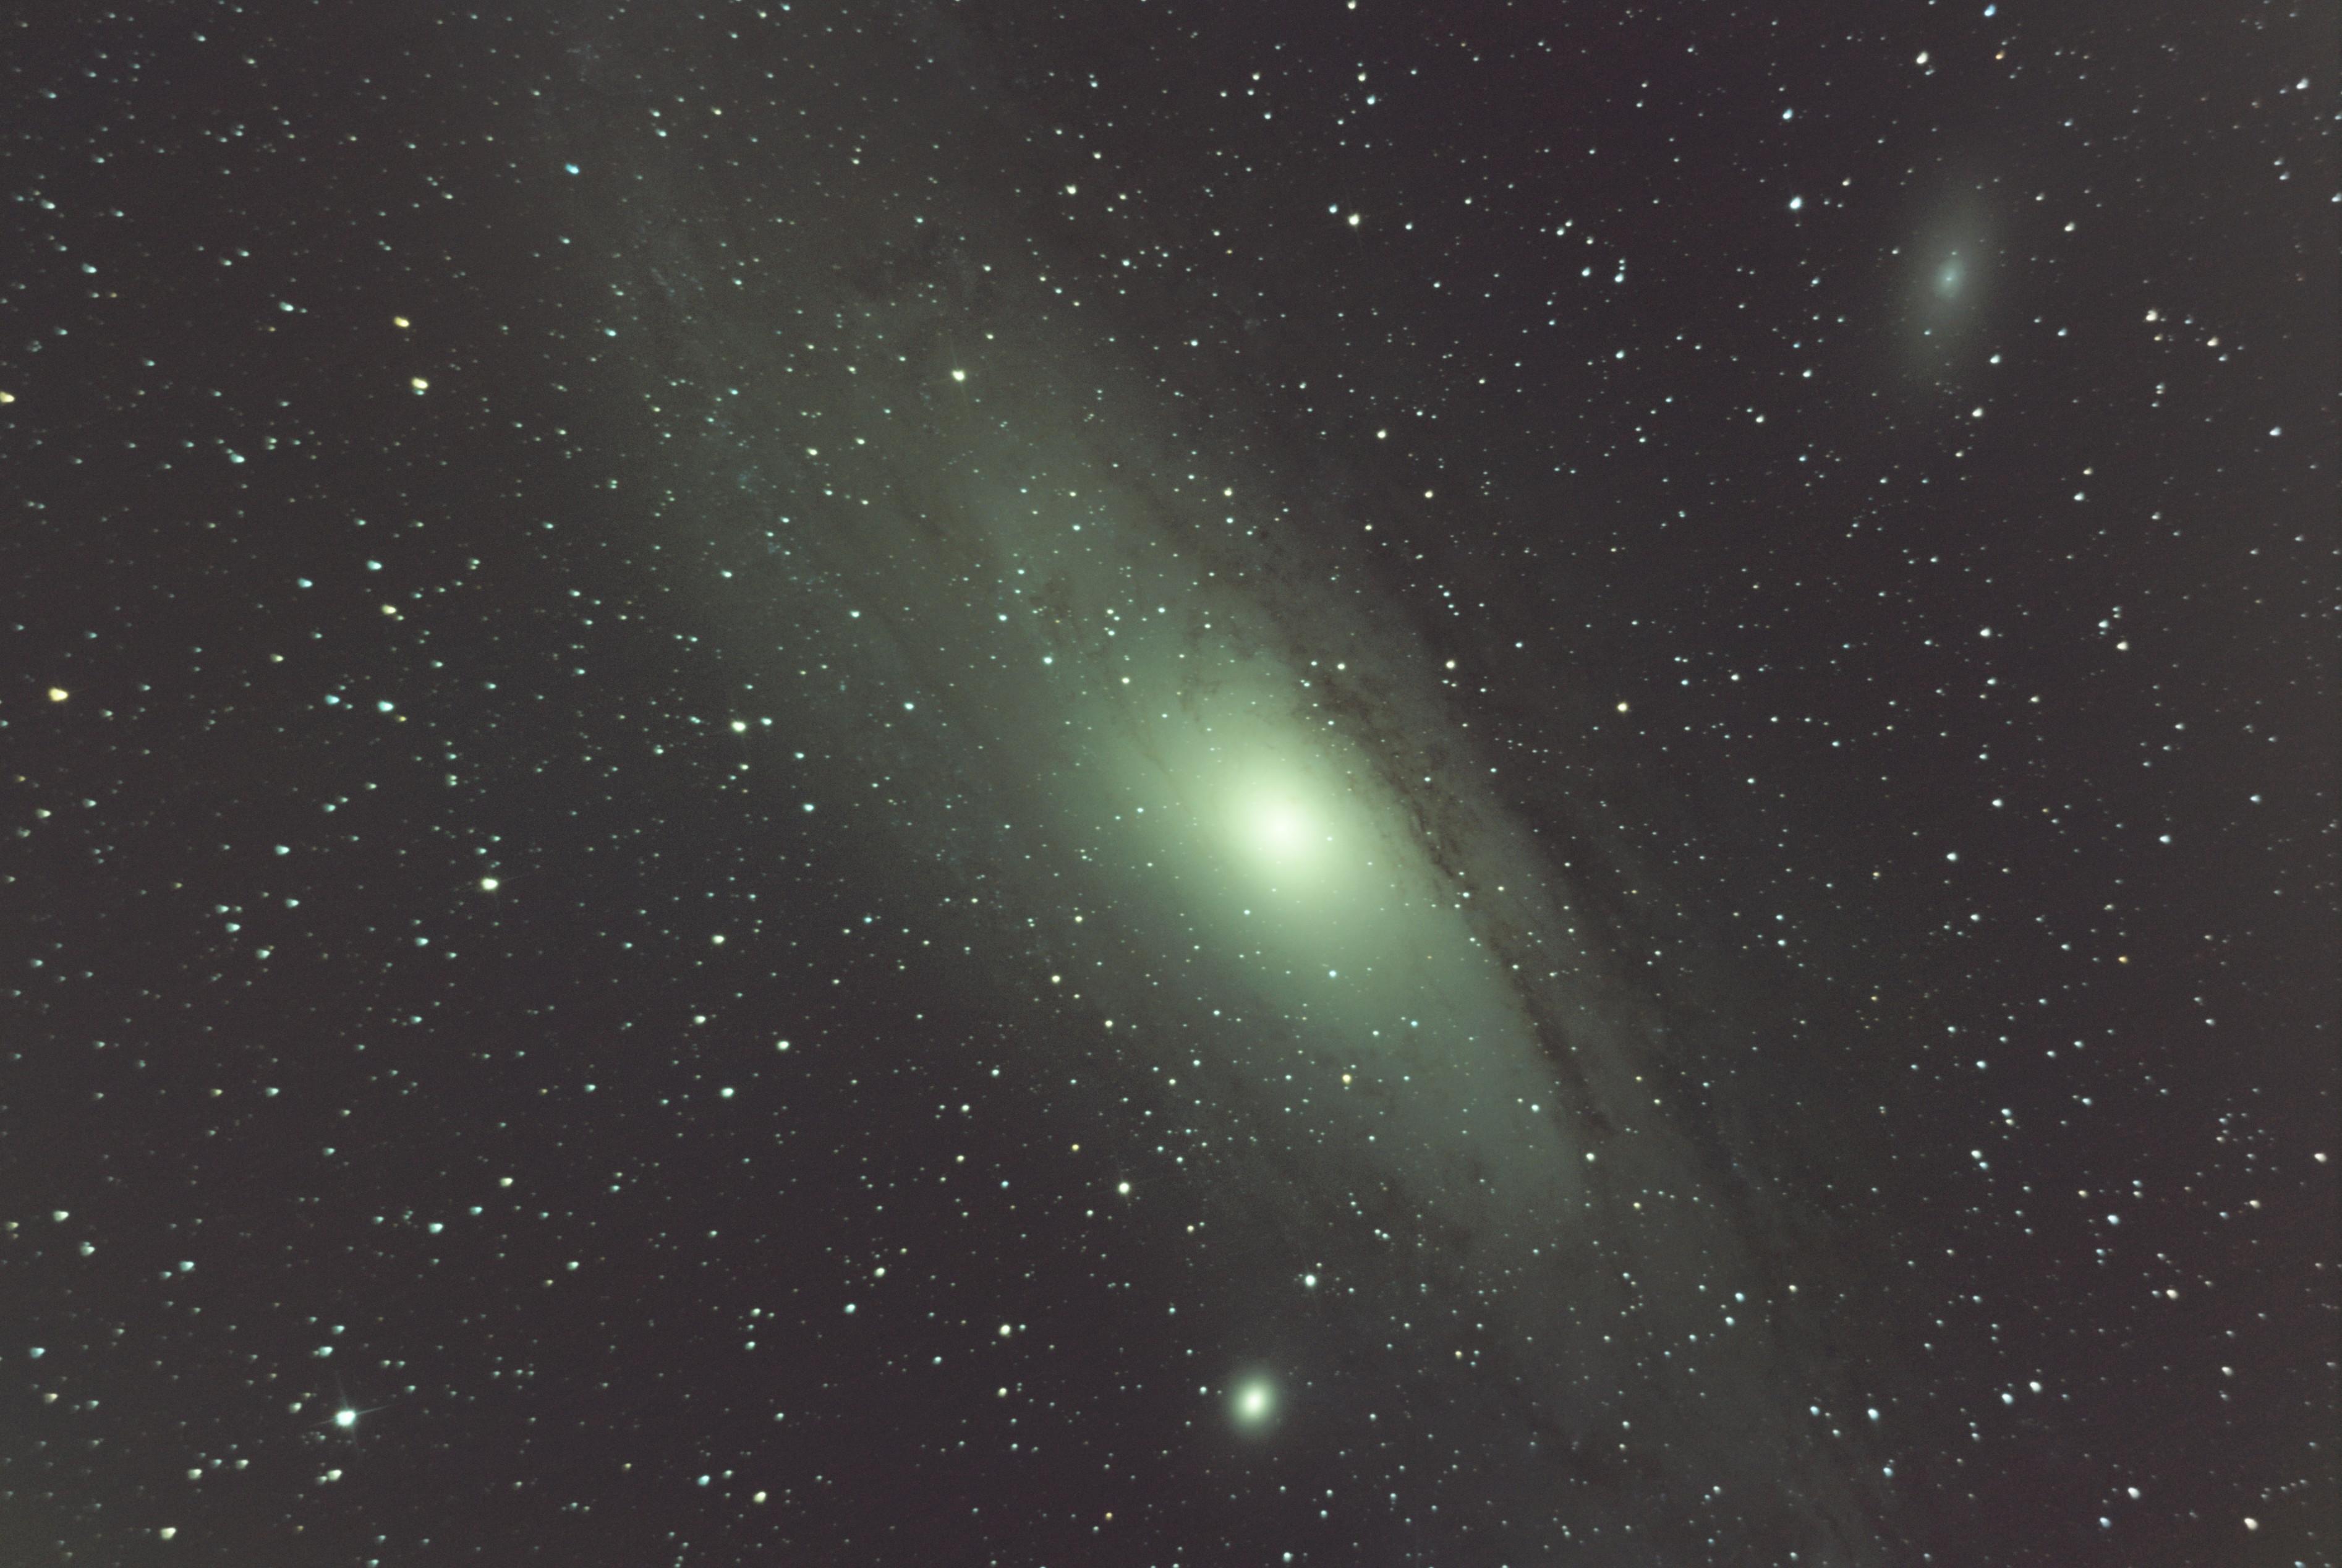 M31 Galaxie d'Andromède M31-0070G0010R